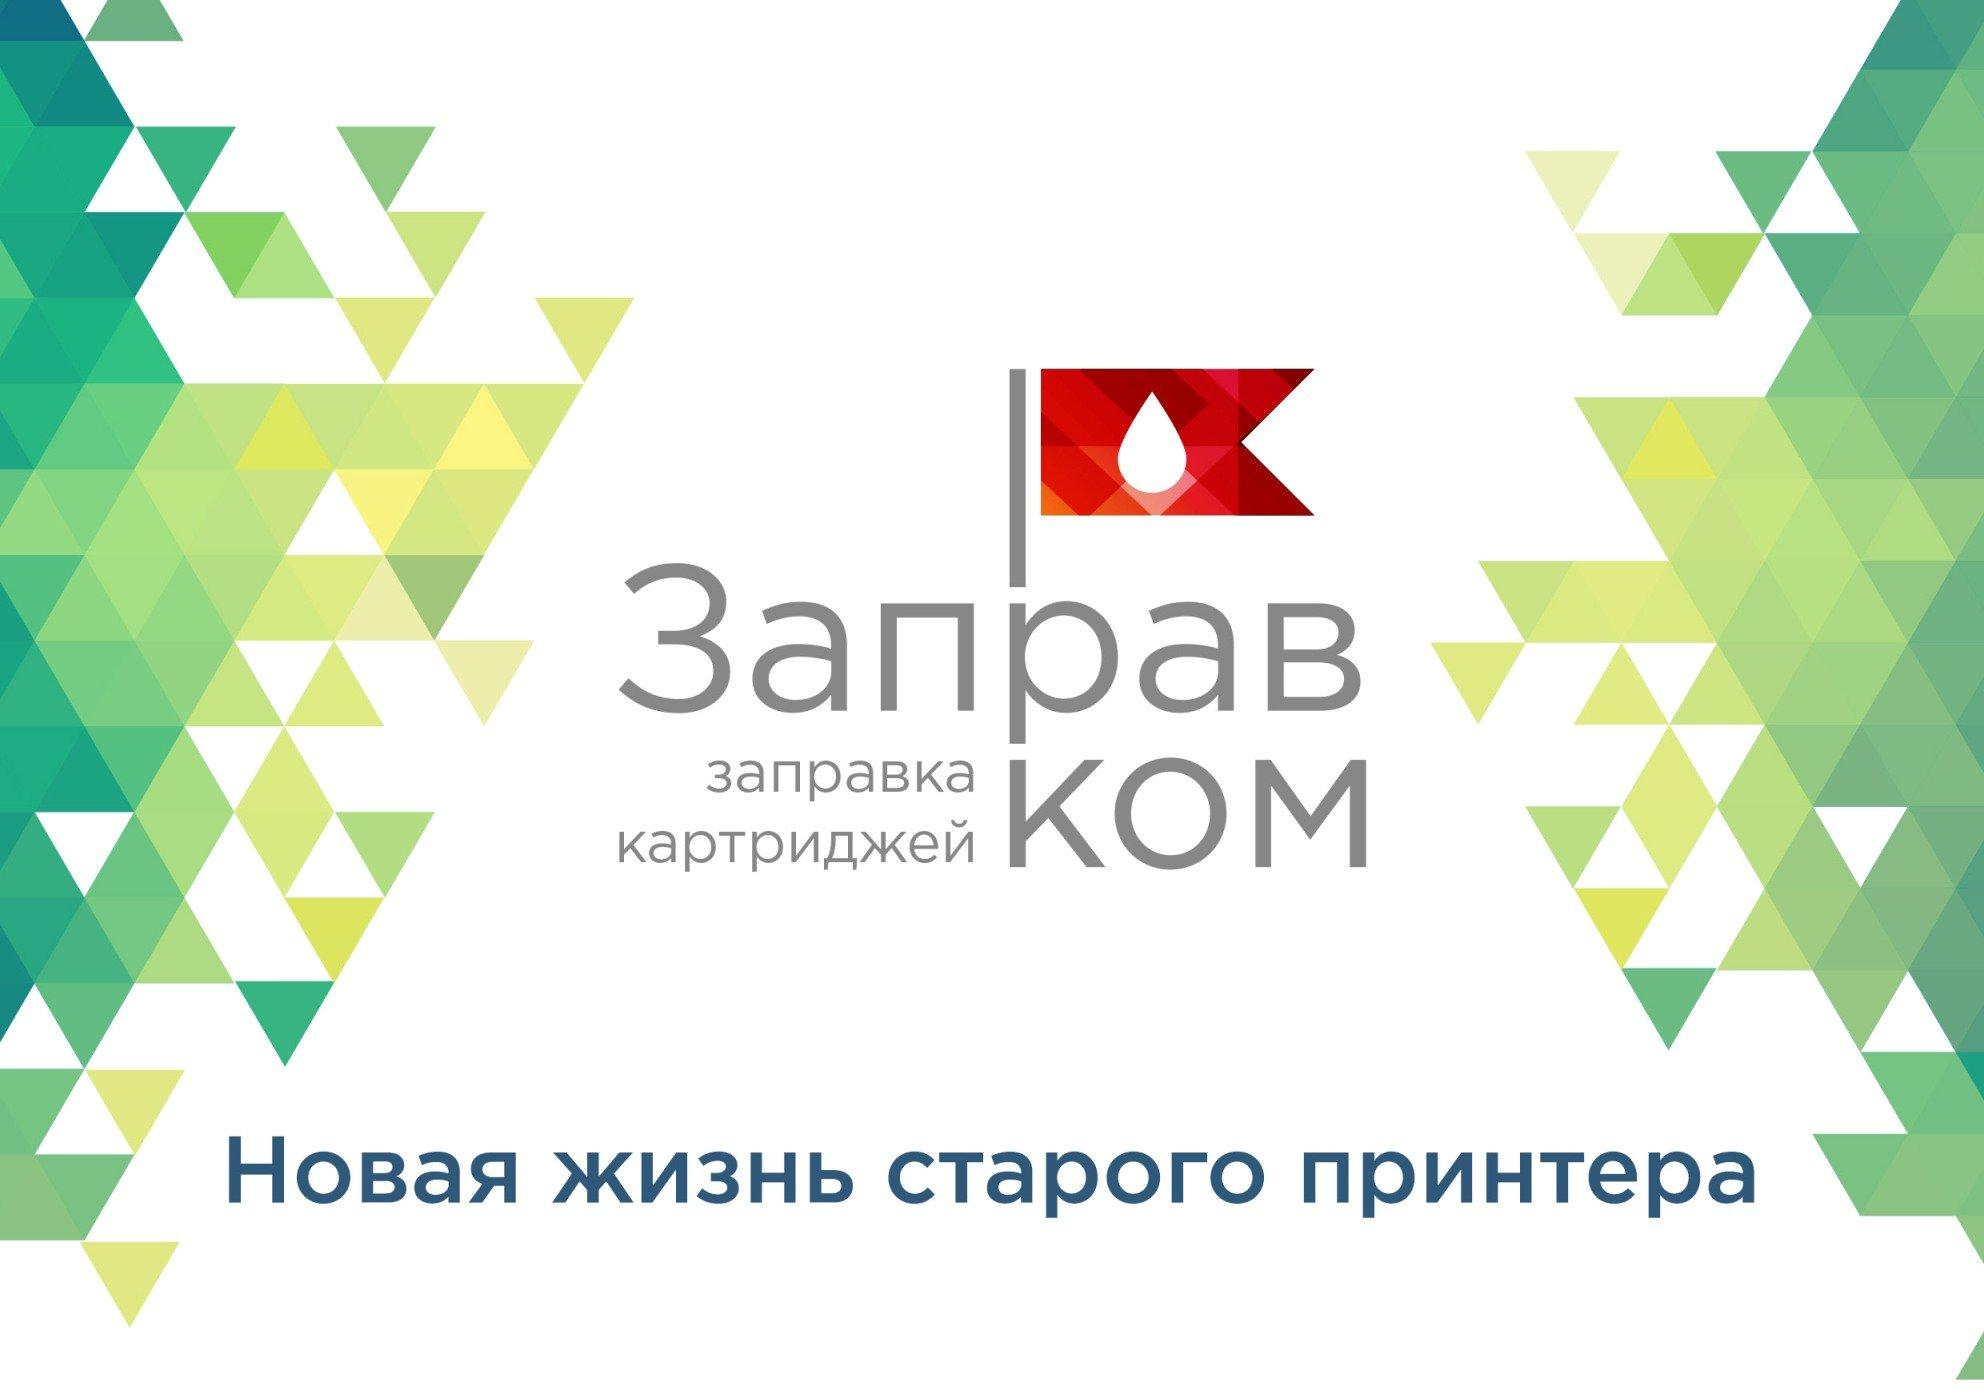 фотография Сервисного центра Заправком на улице Михайлова